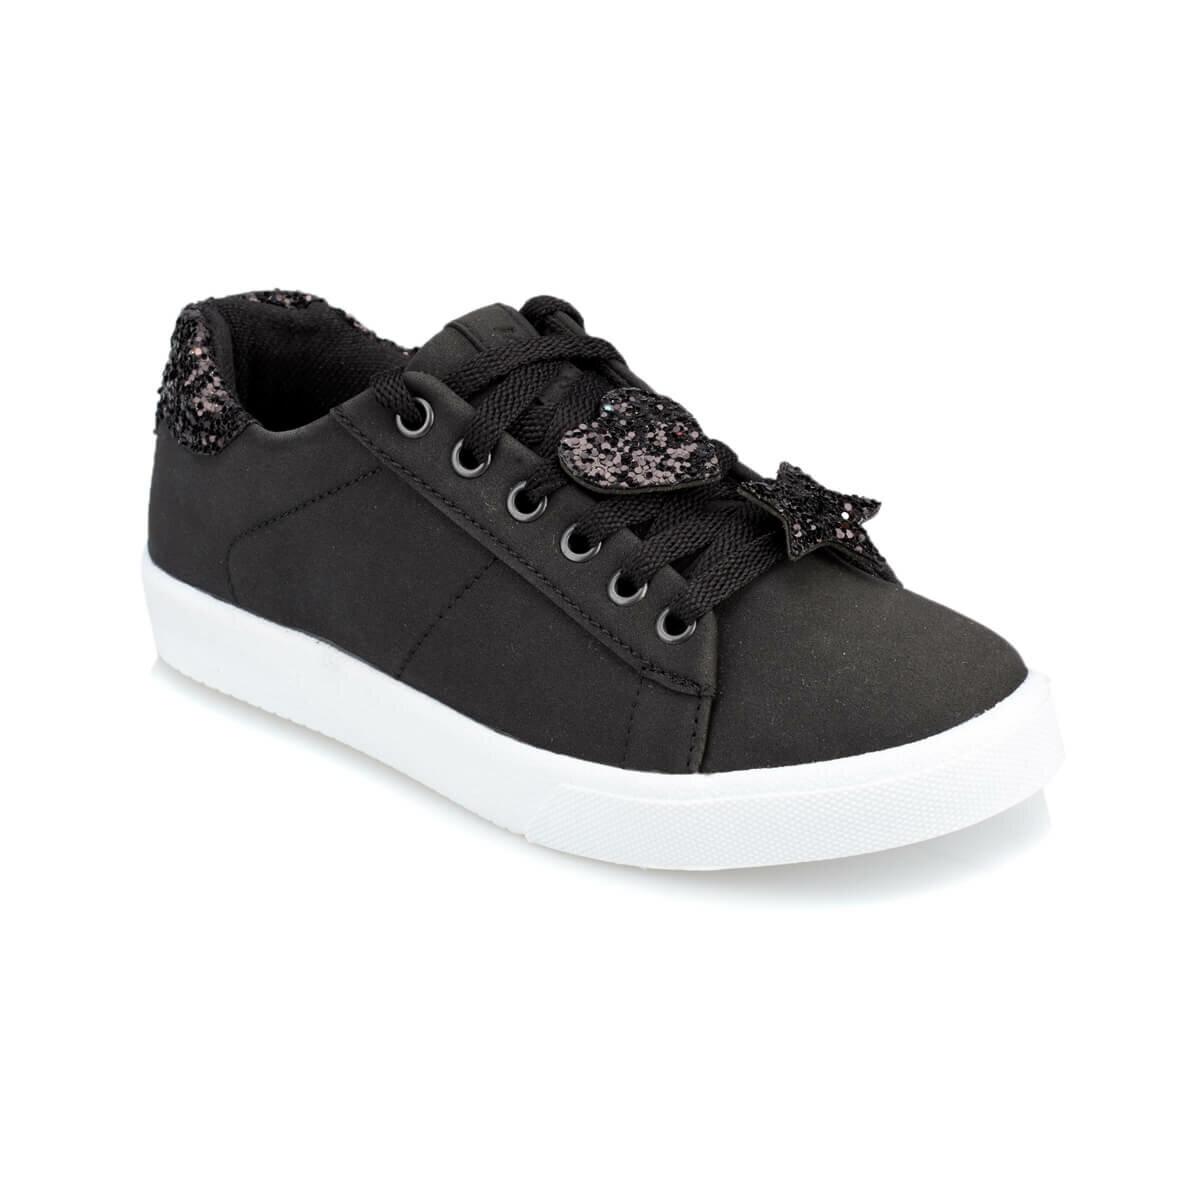 FLO ZENIS Black Female Child Sneaker Shoes KINETIX